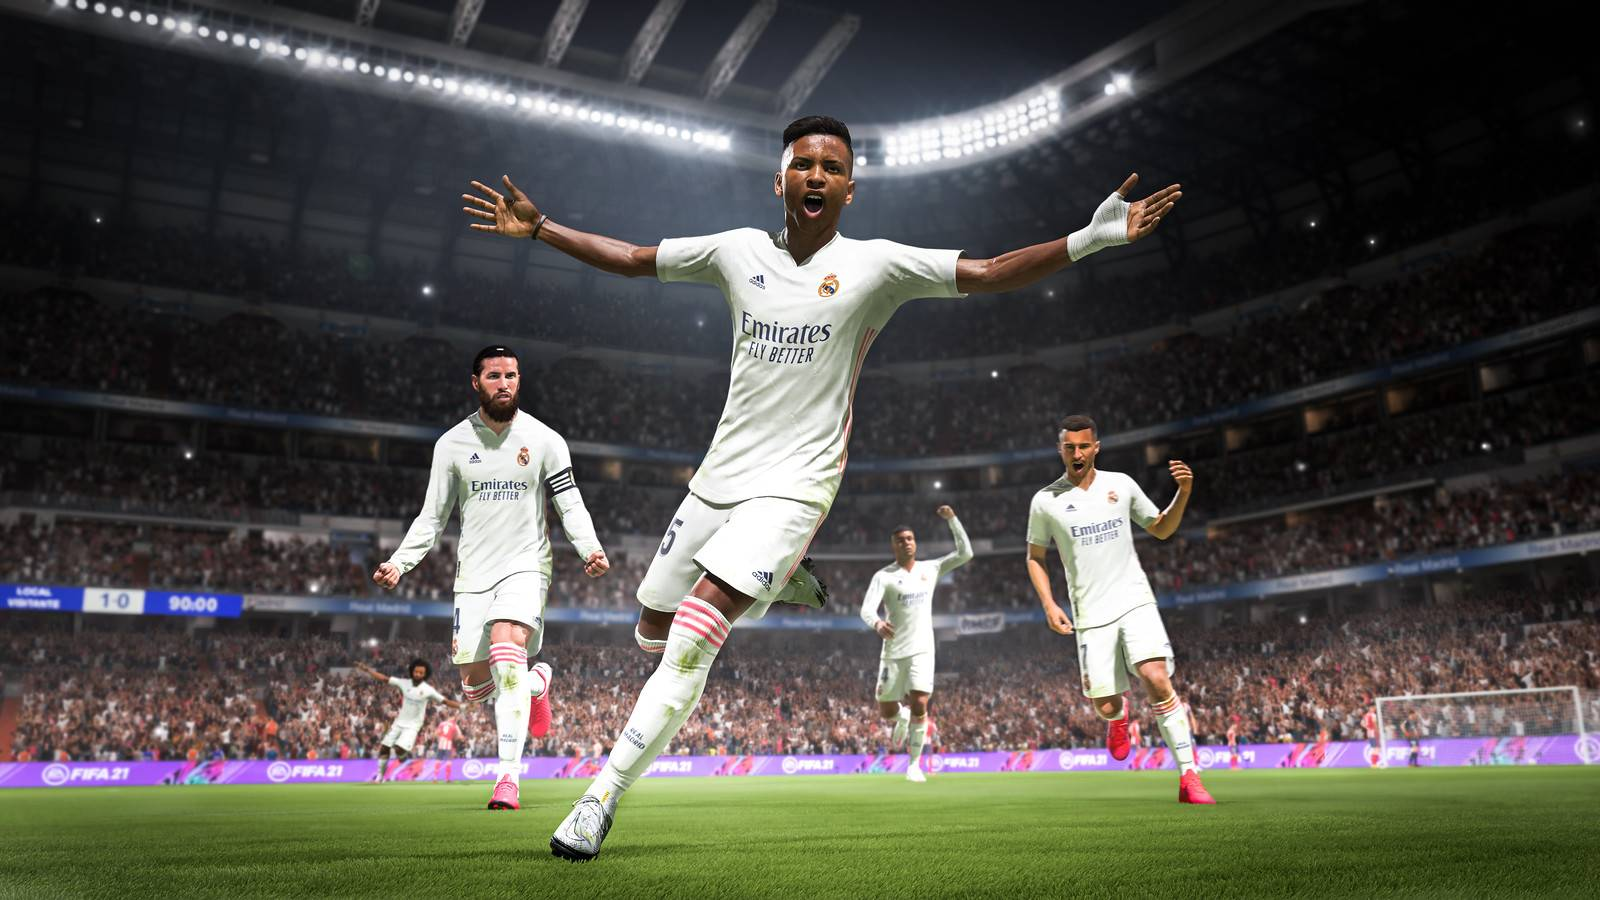 FIFA 21 Real Madrid